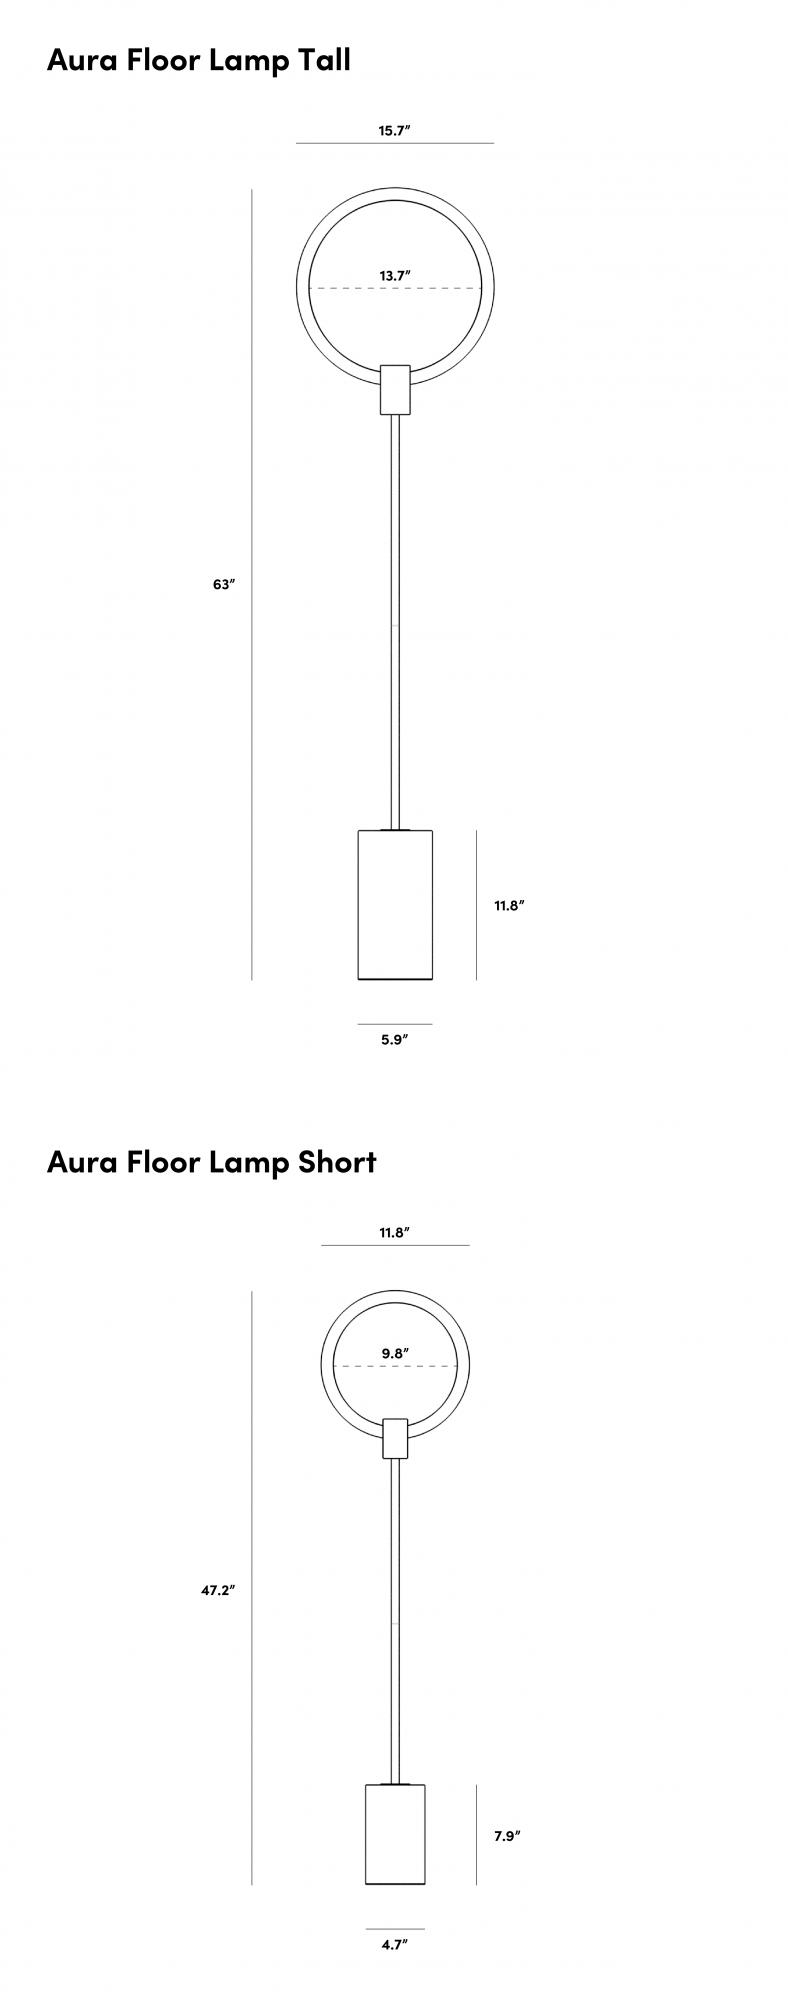 Dimensions for Aura Floor Lamp